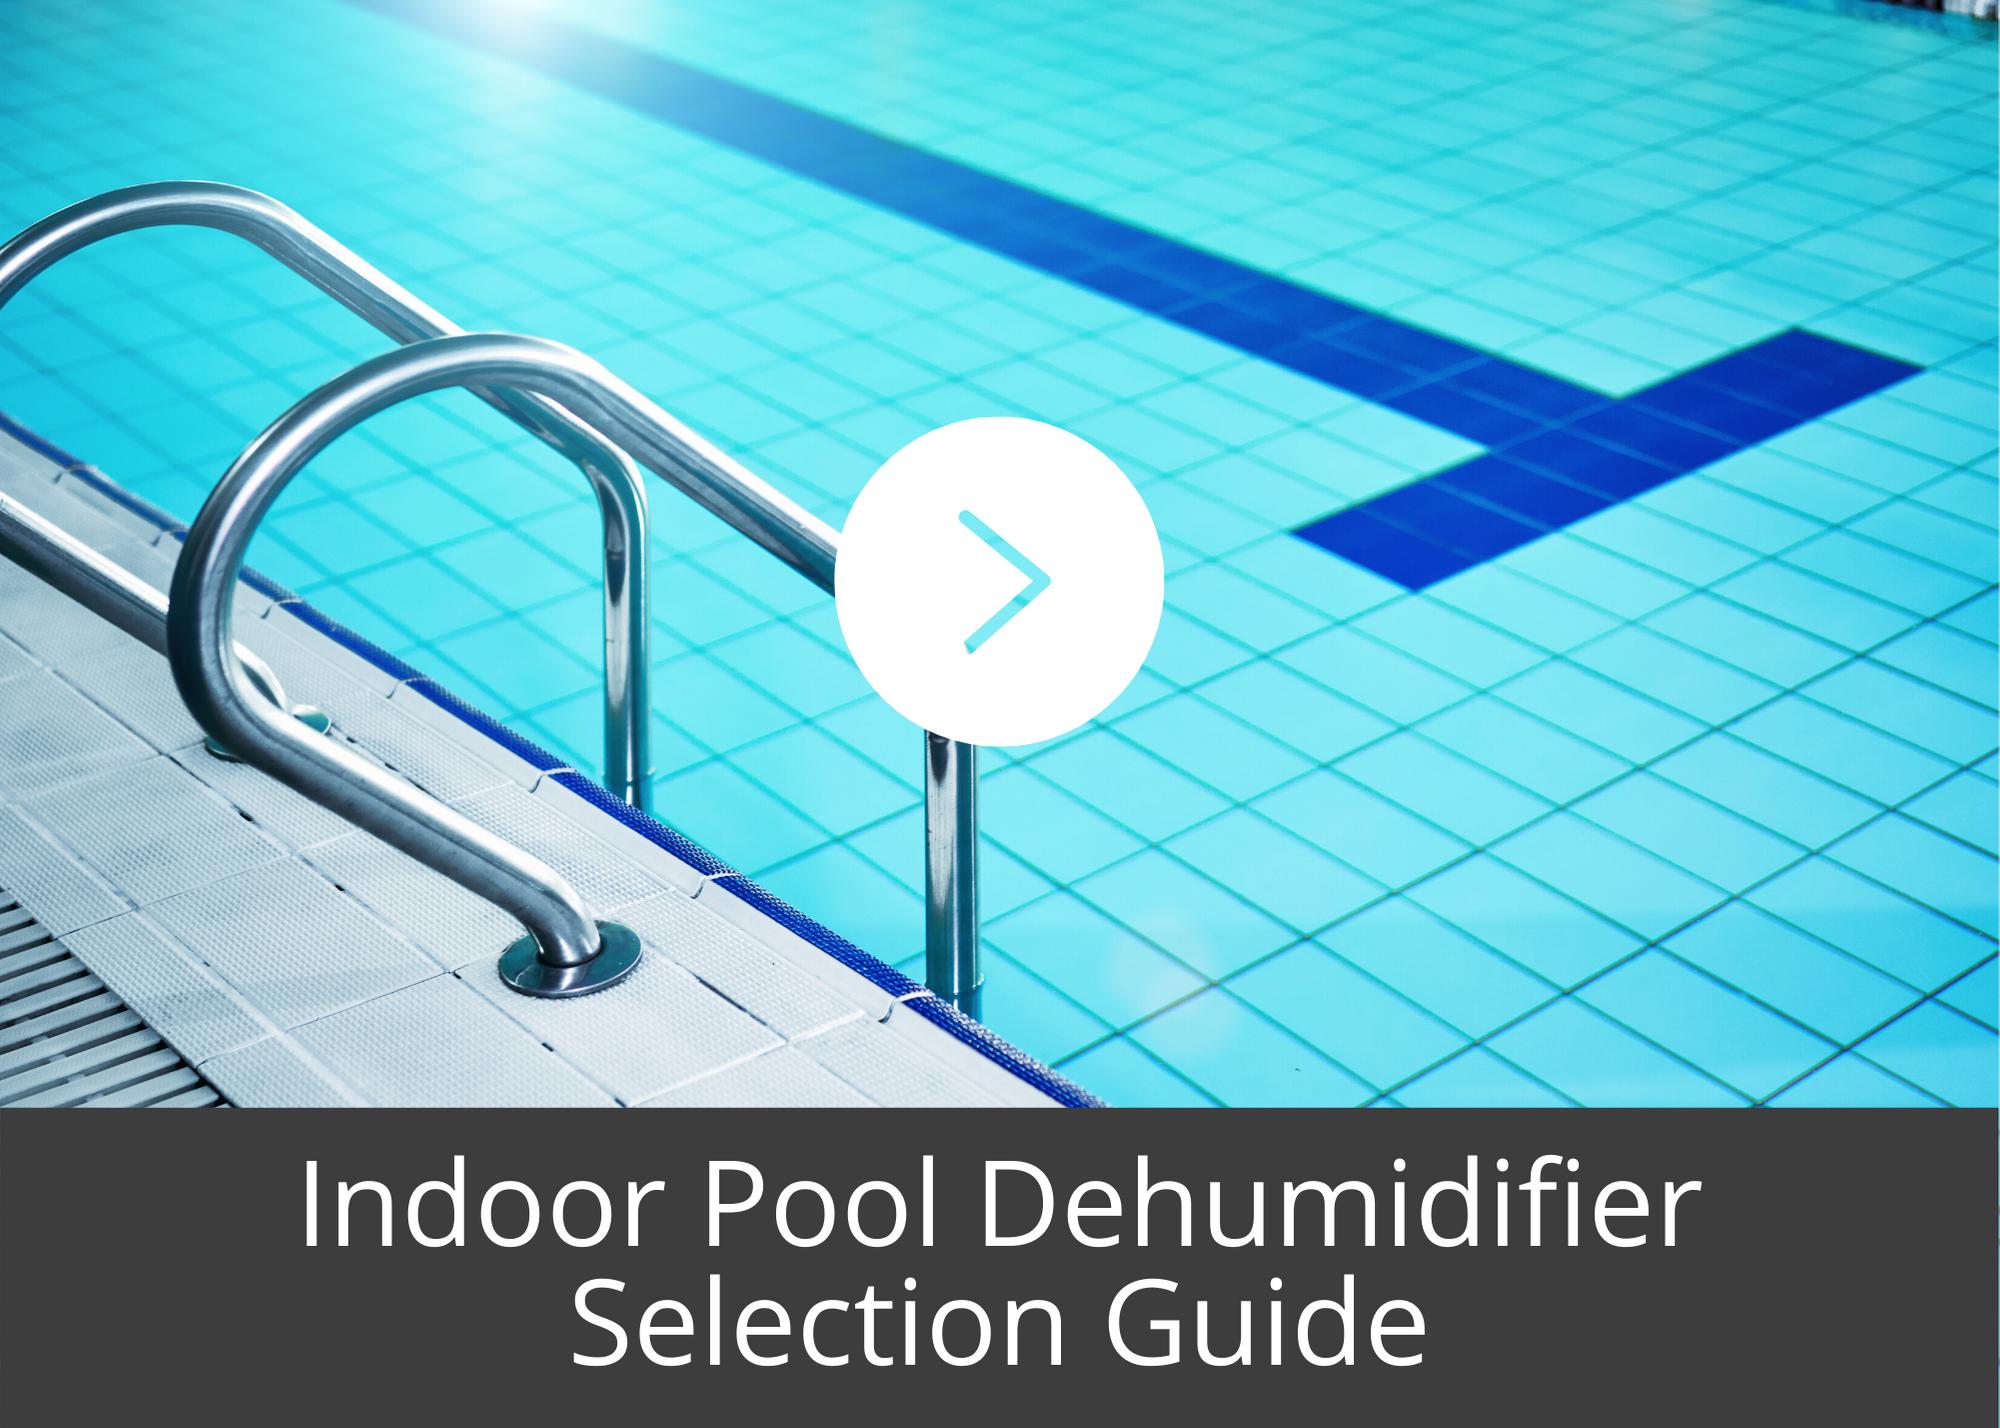 Indoor Pool Dehumidifier Selection Guide